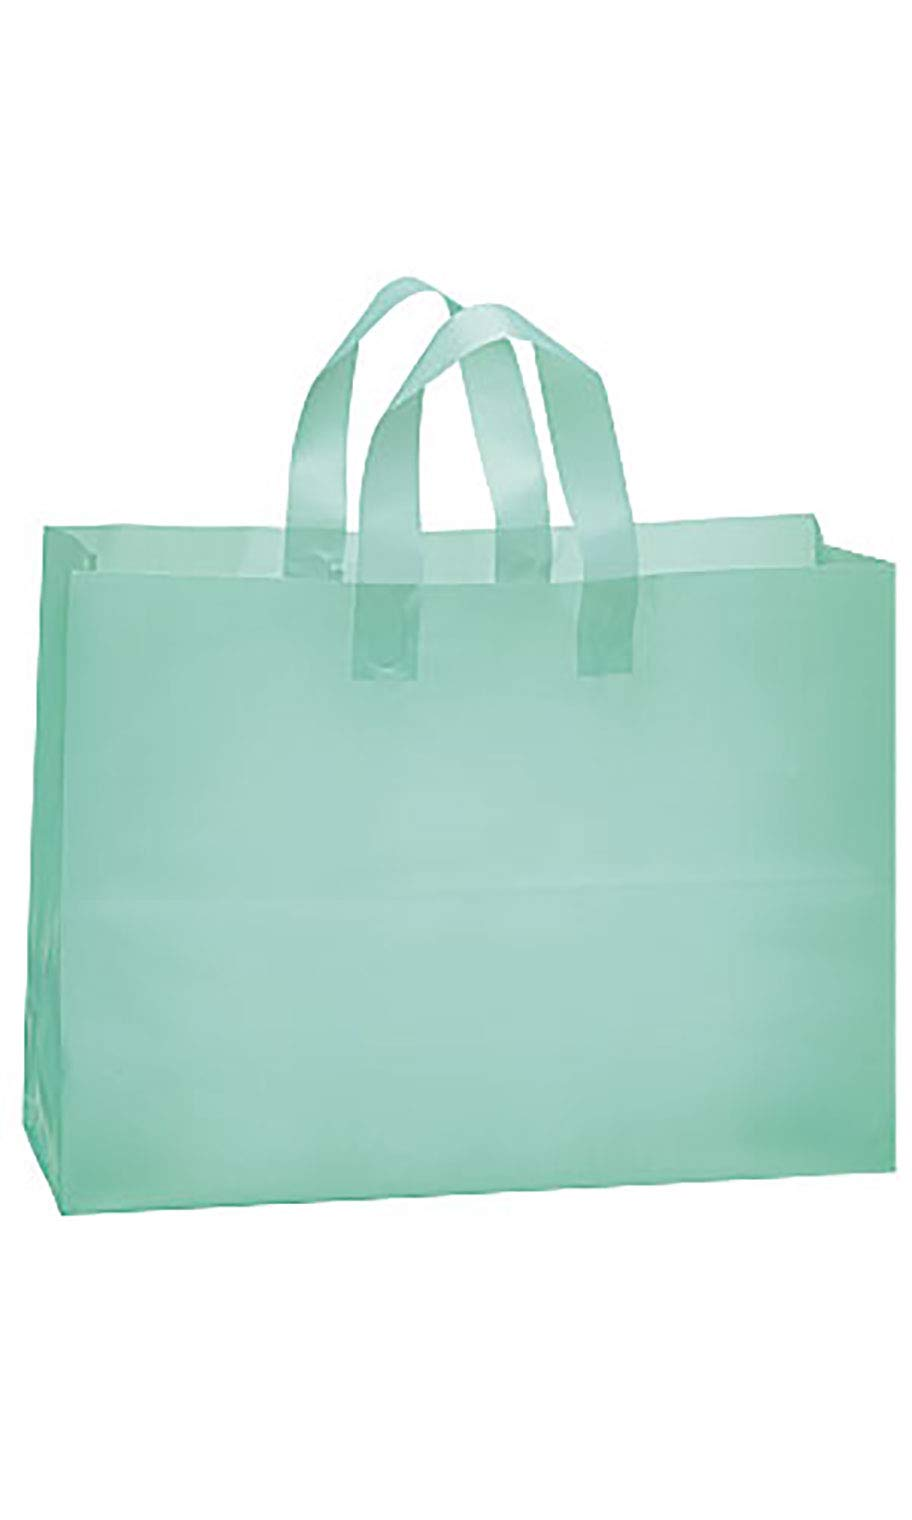 SSWBasics Large Aqua Frosted Plastic Shopping Bags - 16'' x 6'' x 12'' - Case of 100